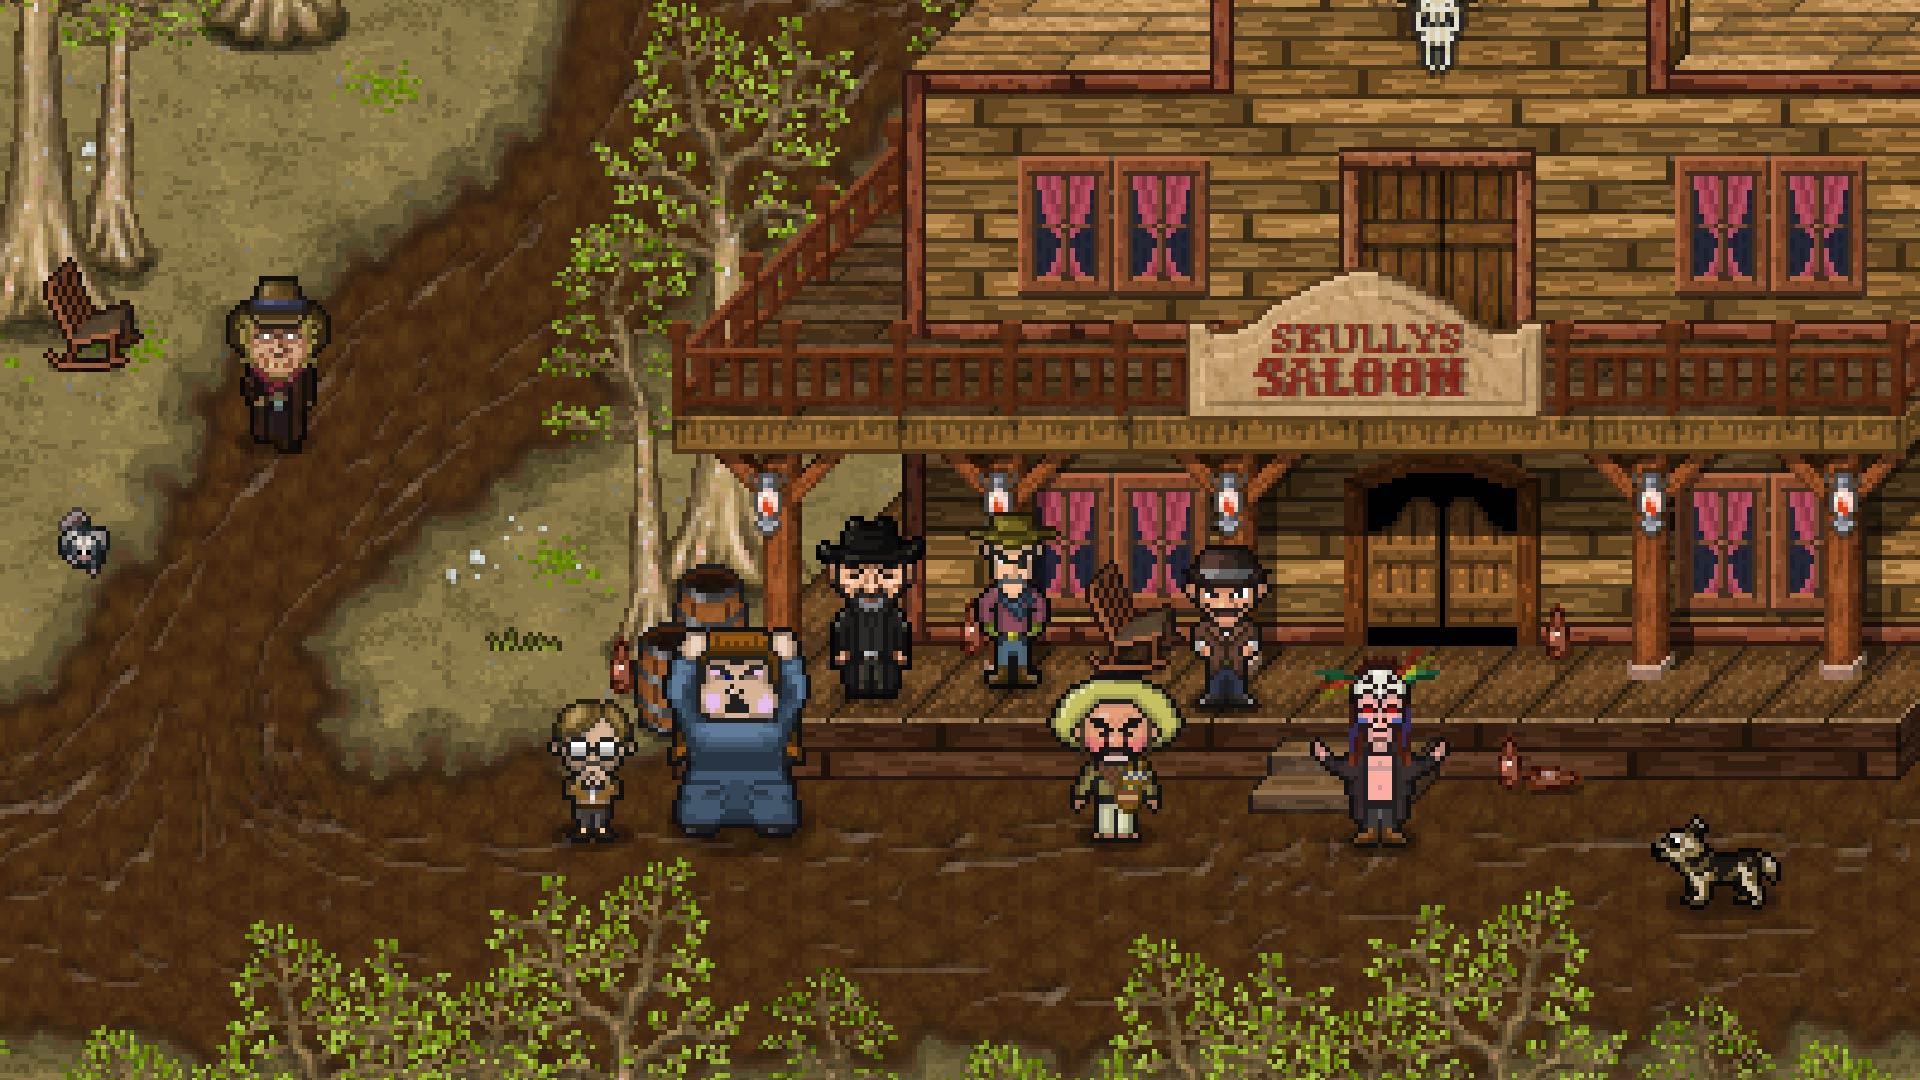 rebuild 3 gangs of deadsville русификатор